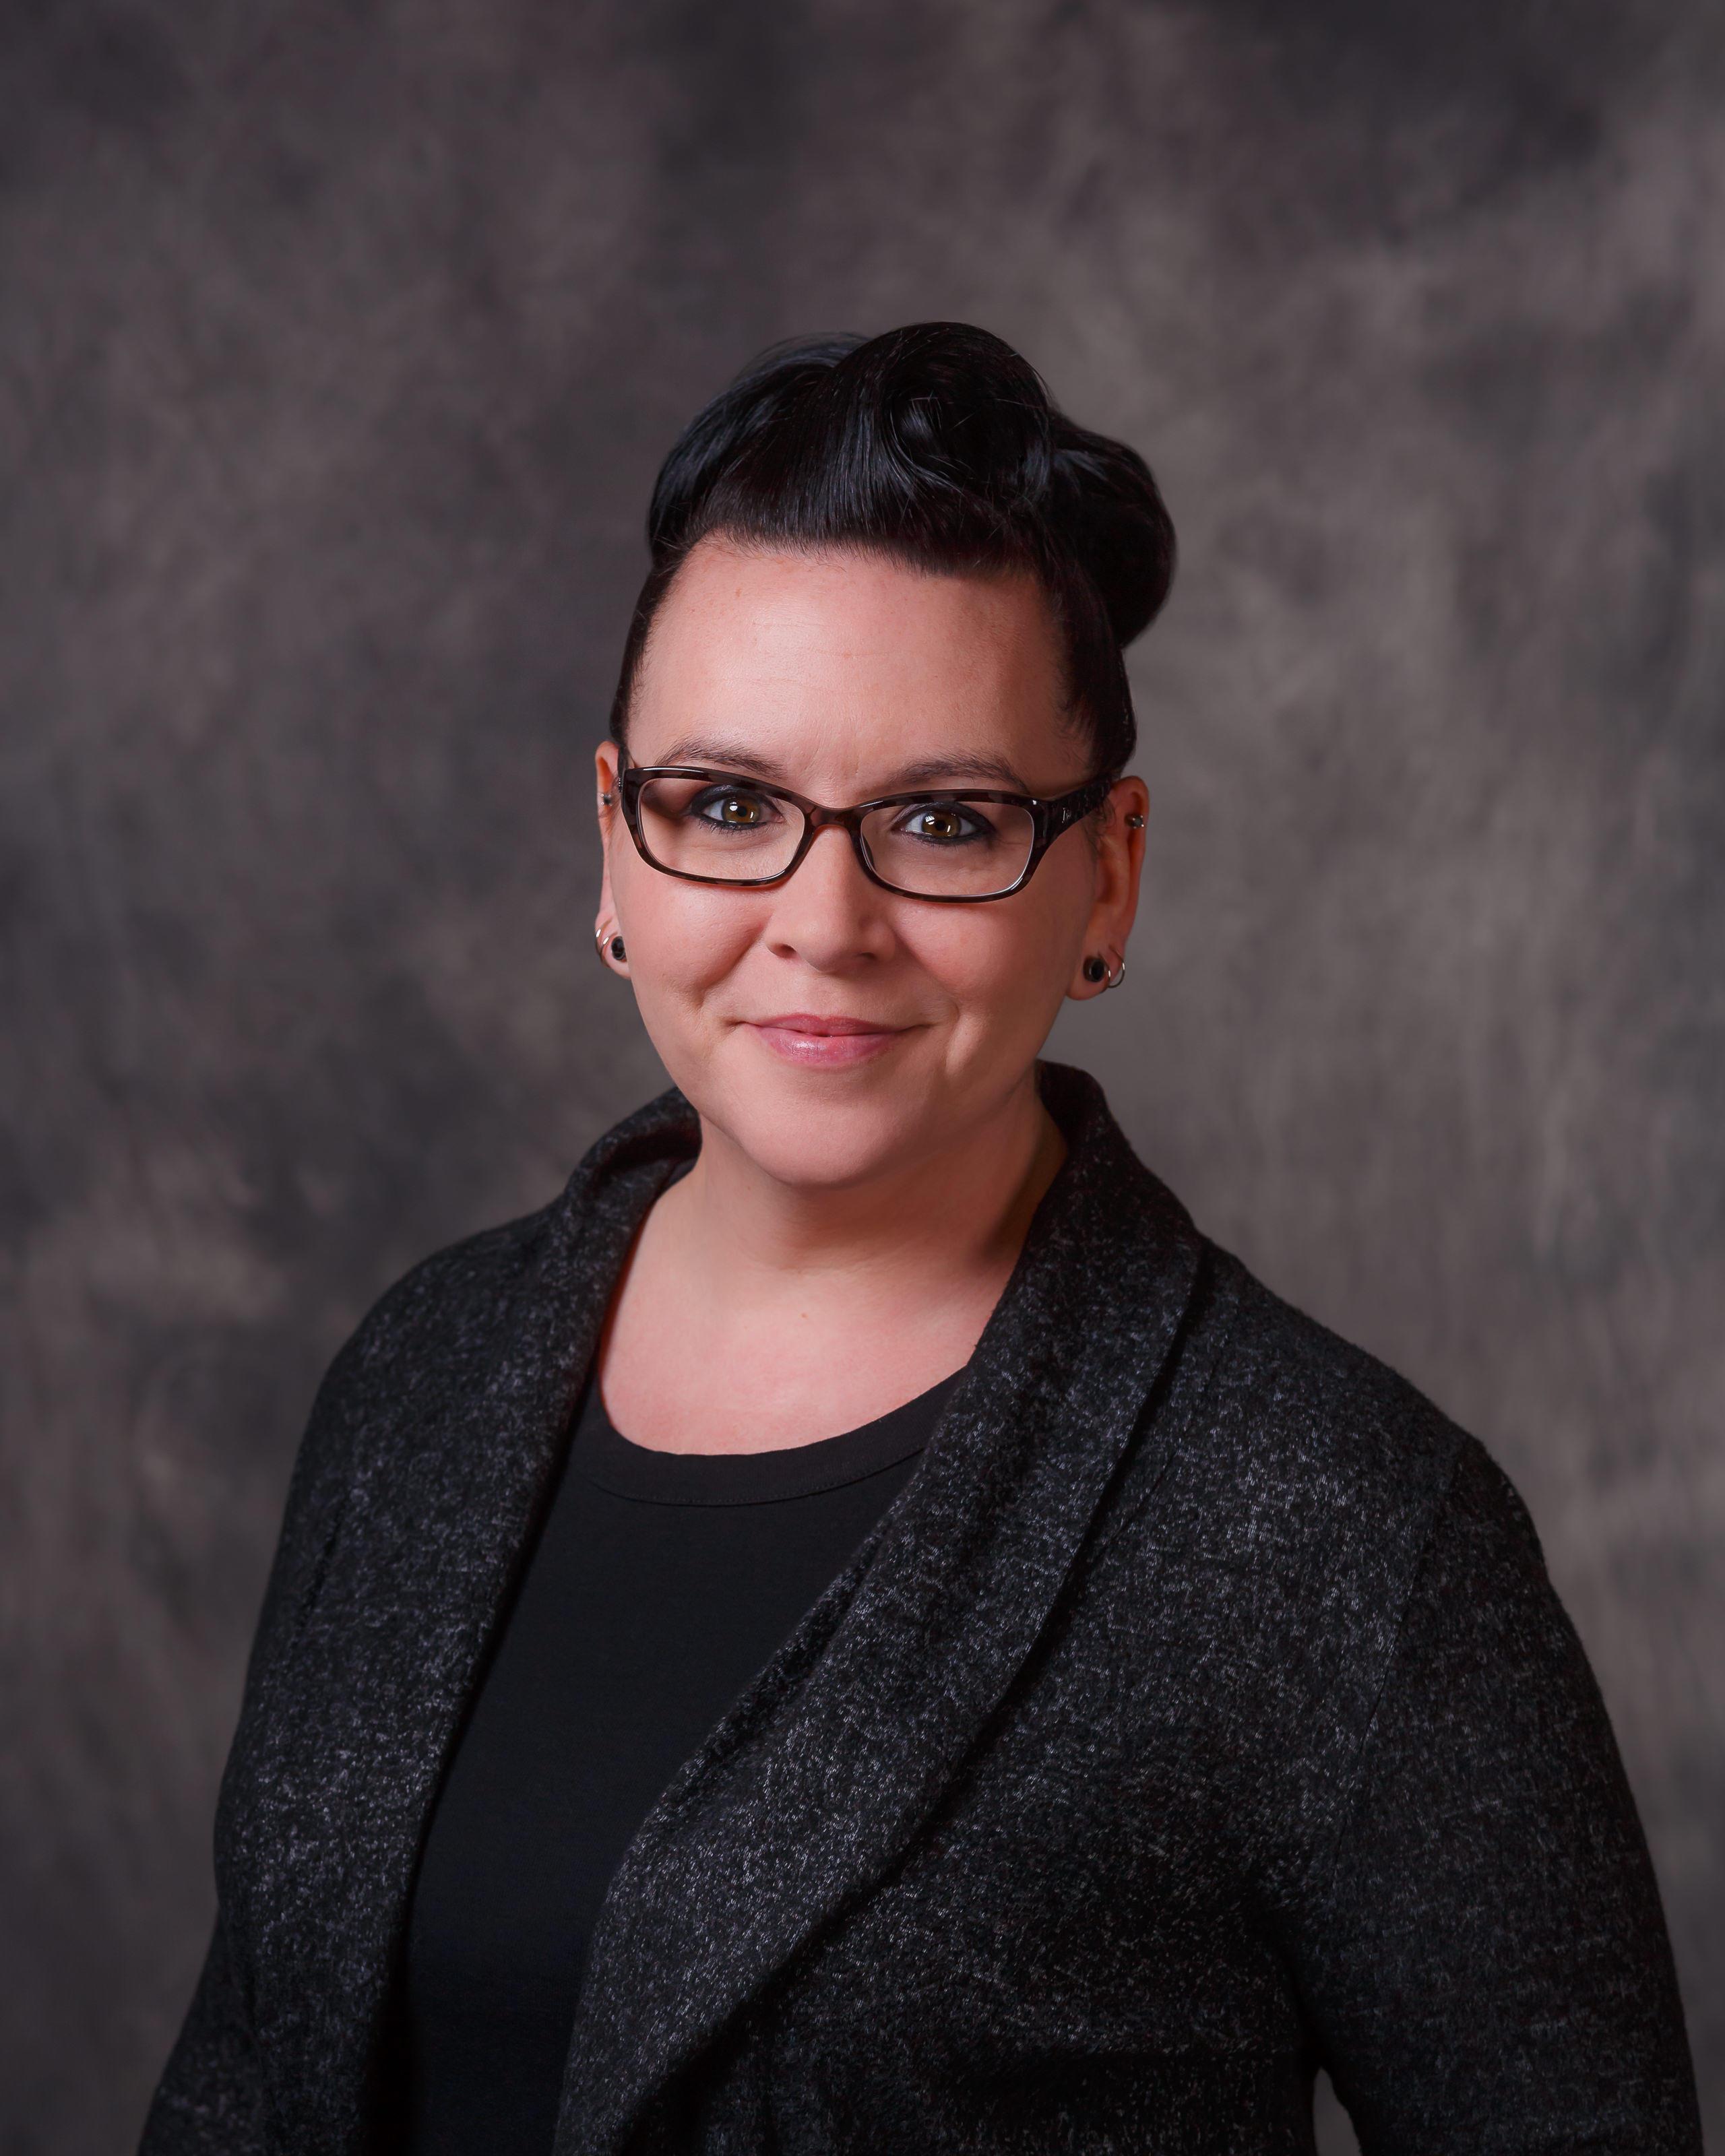 Allstate insurance agent Tiffany McLeod